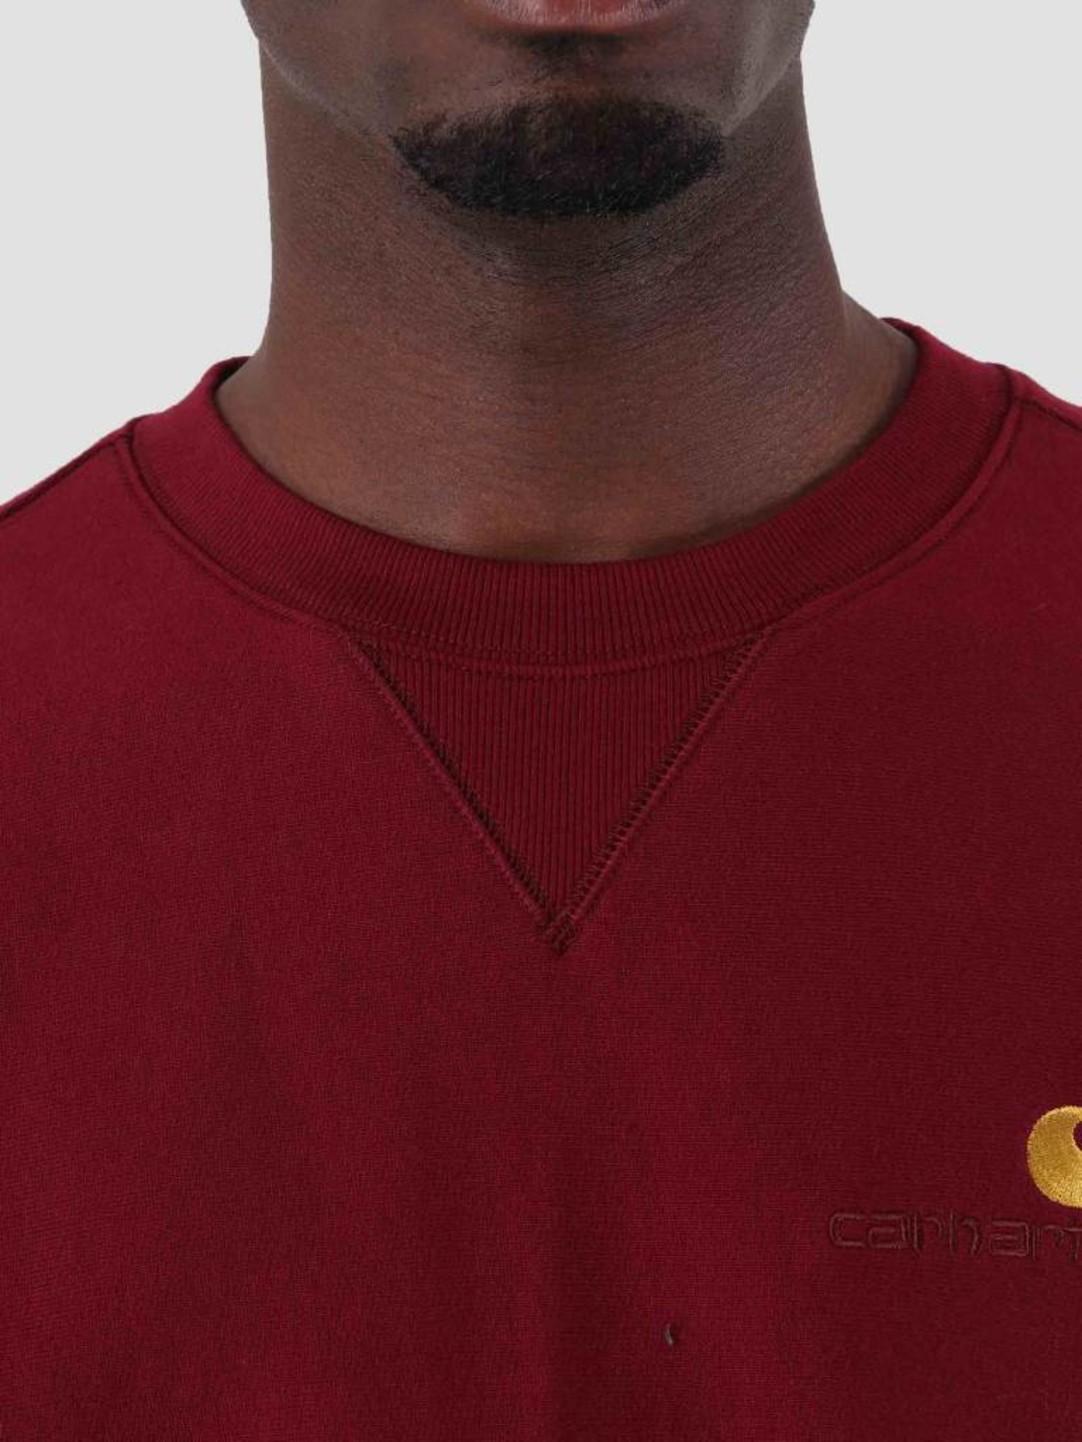 Carhartt WIP Carhartt WIP American Script Sweat Mulberry I025475-88400